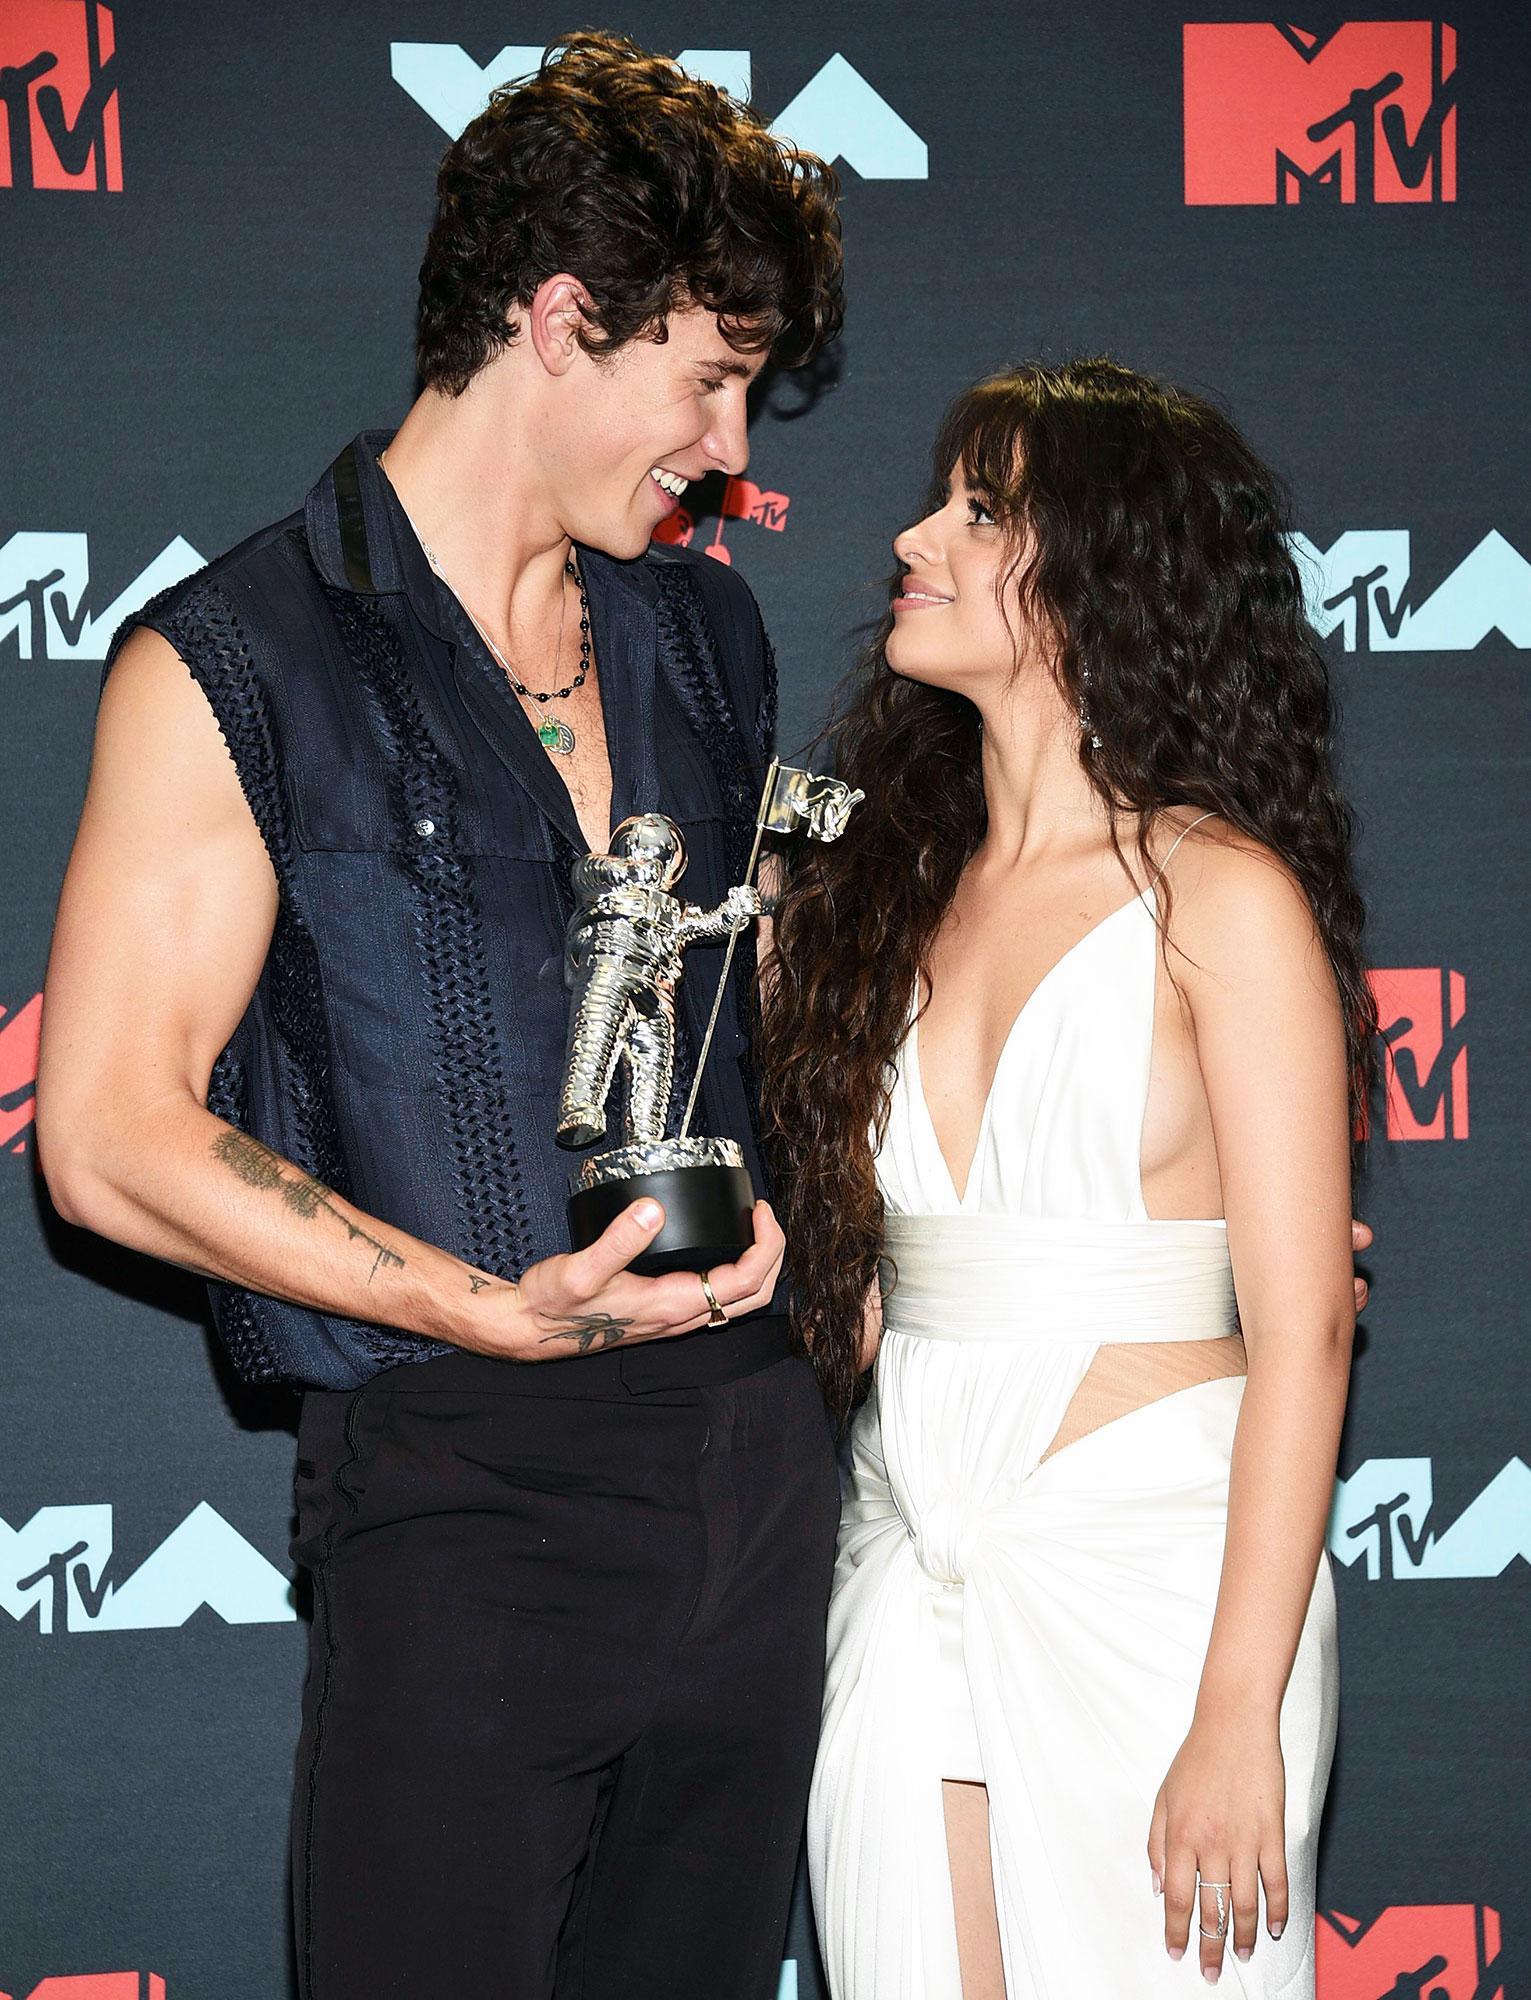 hawn Mendes and Camila Cabello MTV VMAs 2019 Sloppy Kiss Video